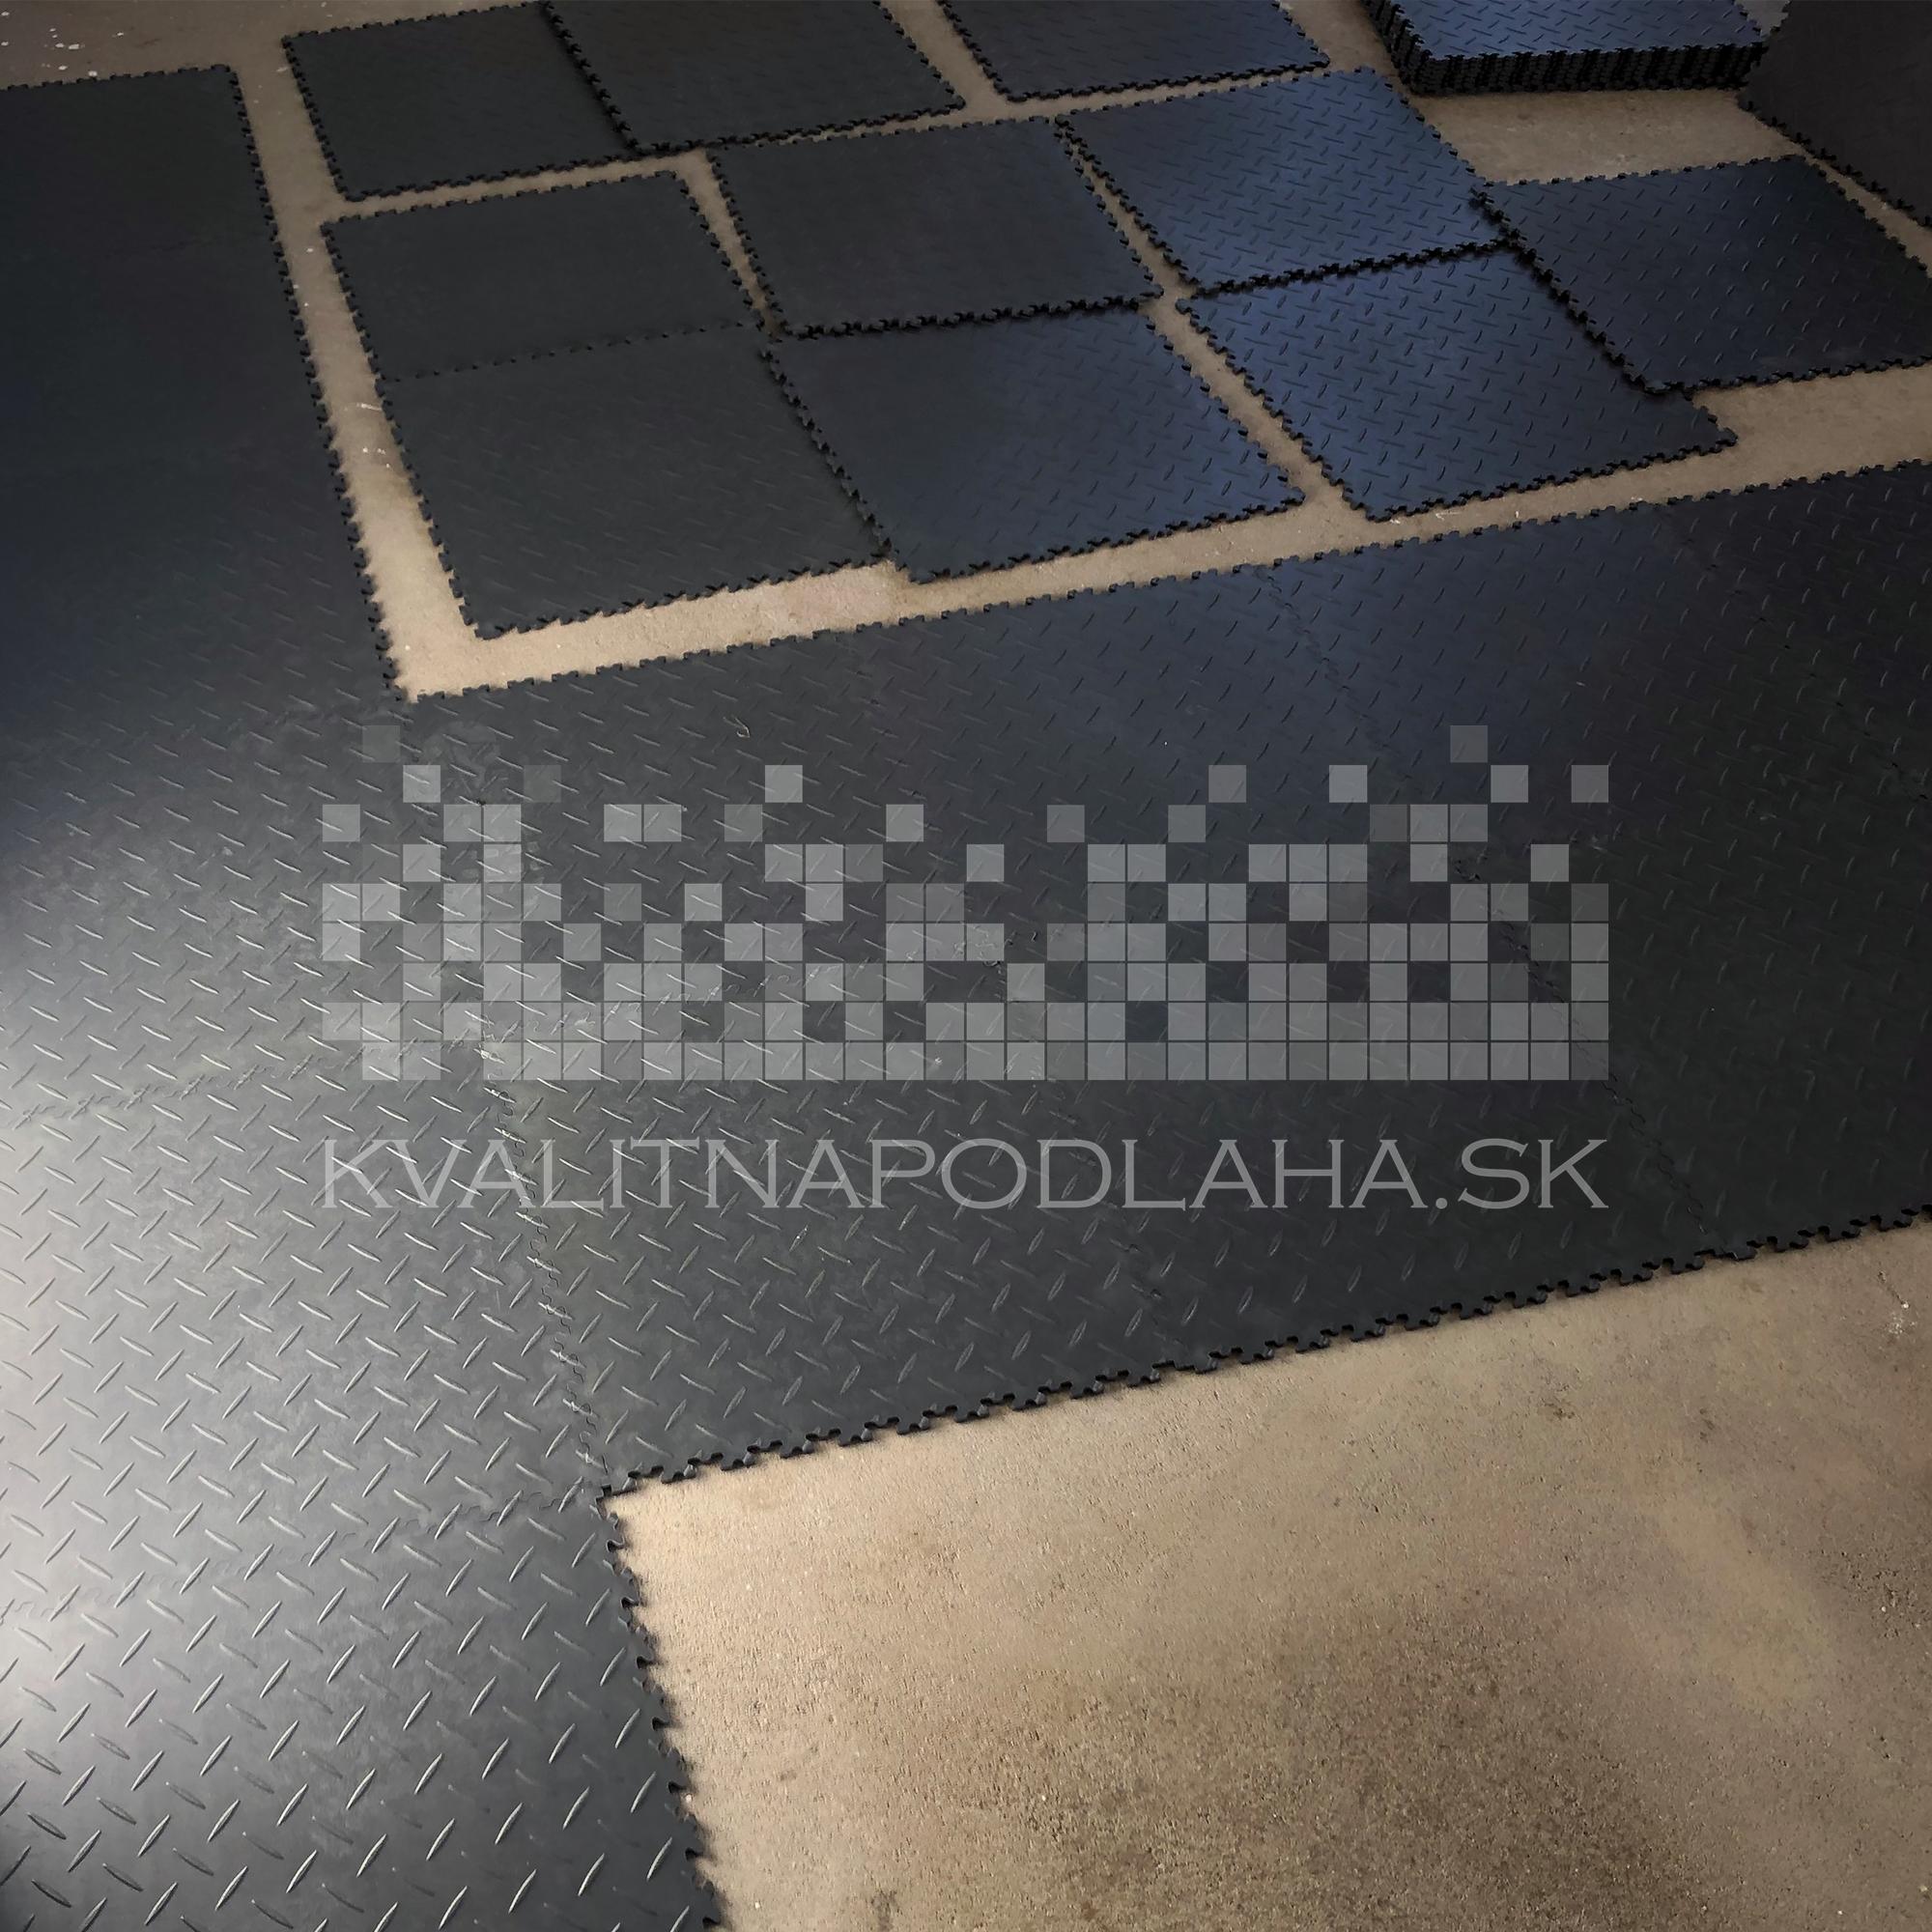 Montáž PVC podlahy Fortelock v záhradnom domčeku